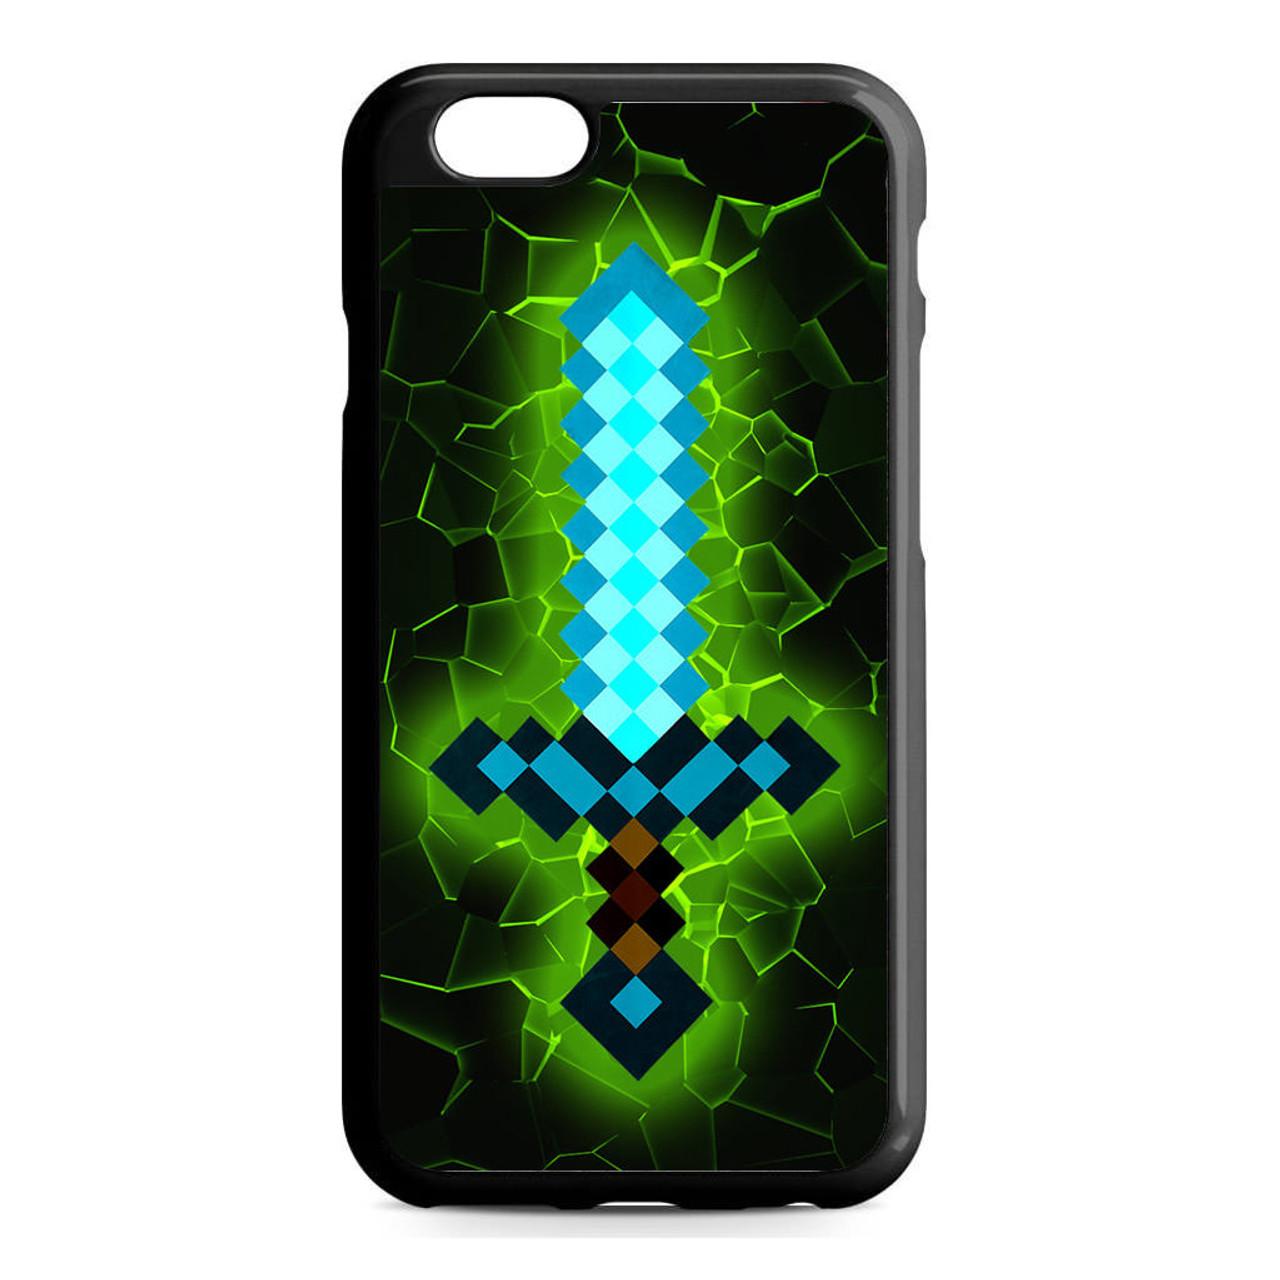 minecraft phone case iphone 6